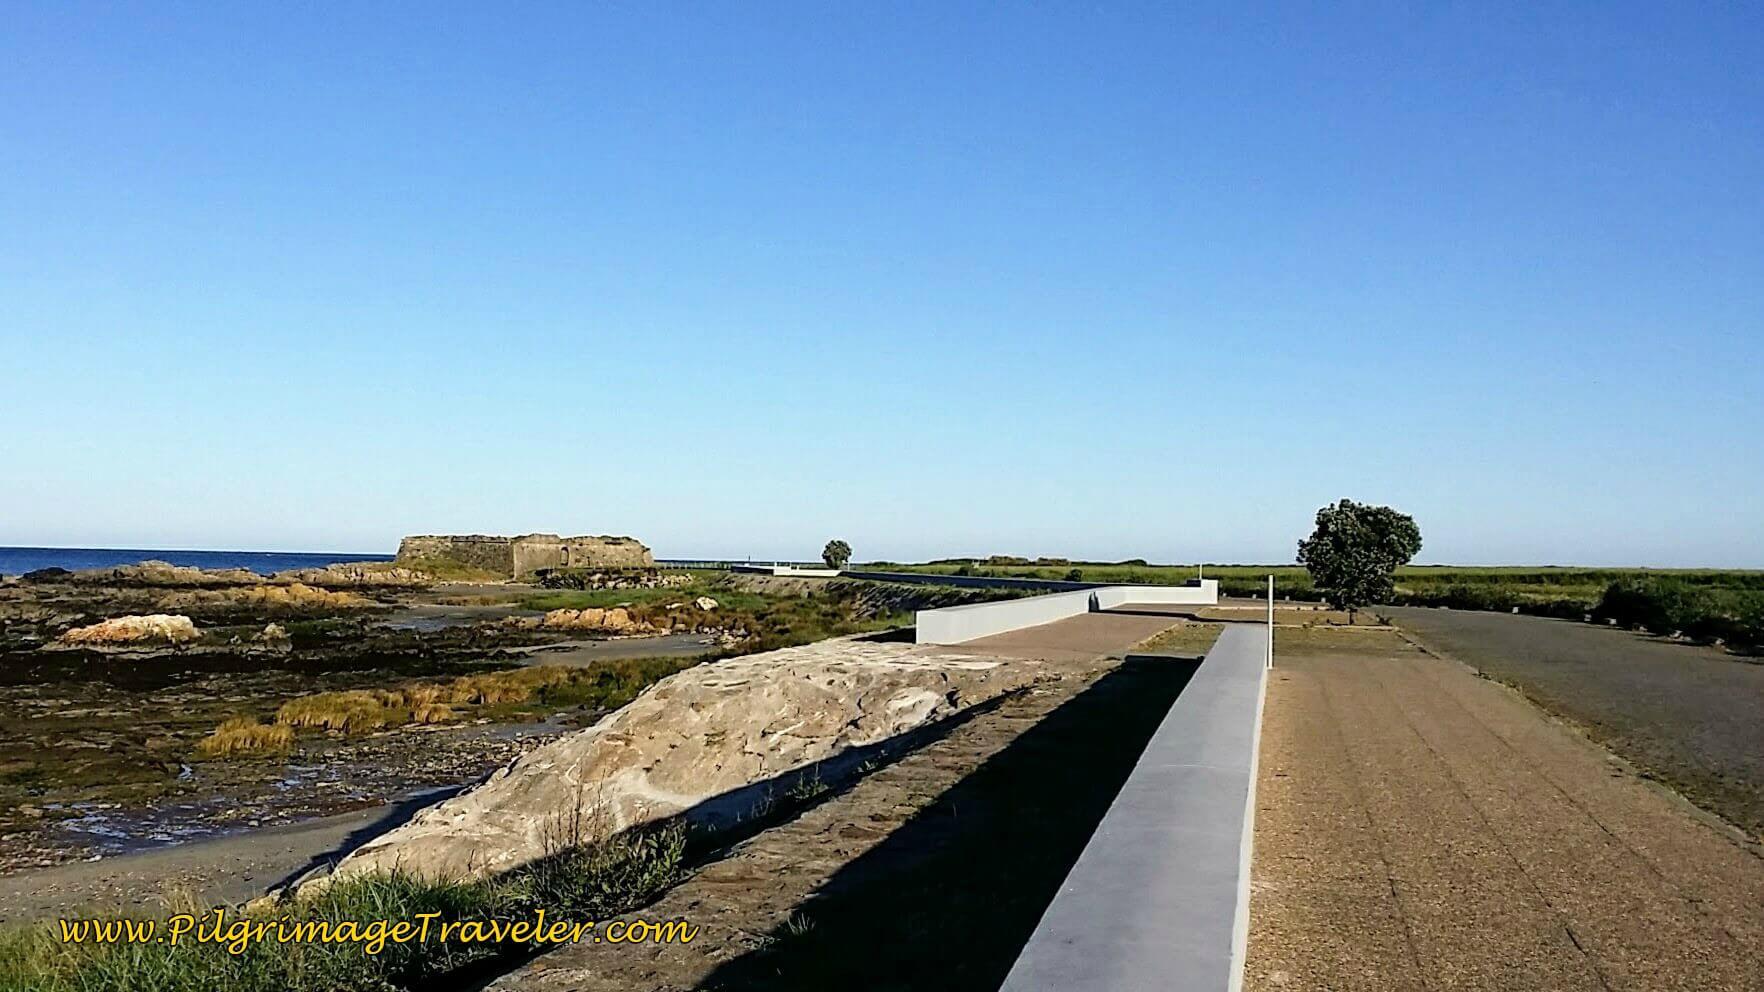 Approaching the Forte de Rego de Fontes on the Senda Litoral on day eighteen of the Camino Portugués on the Senda Litoral